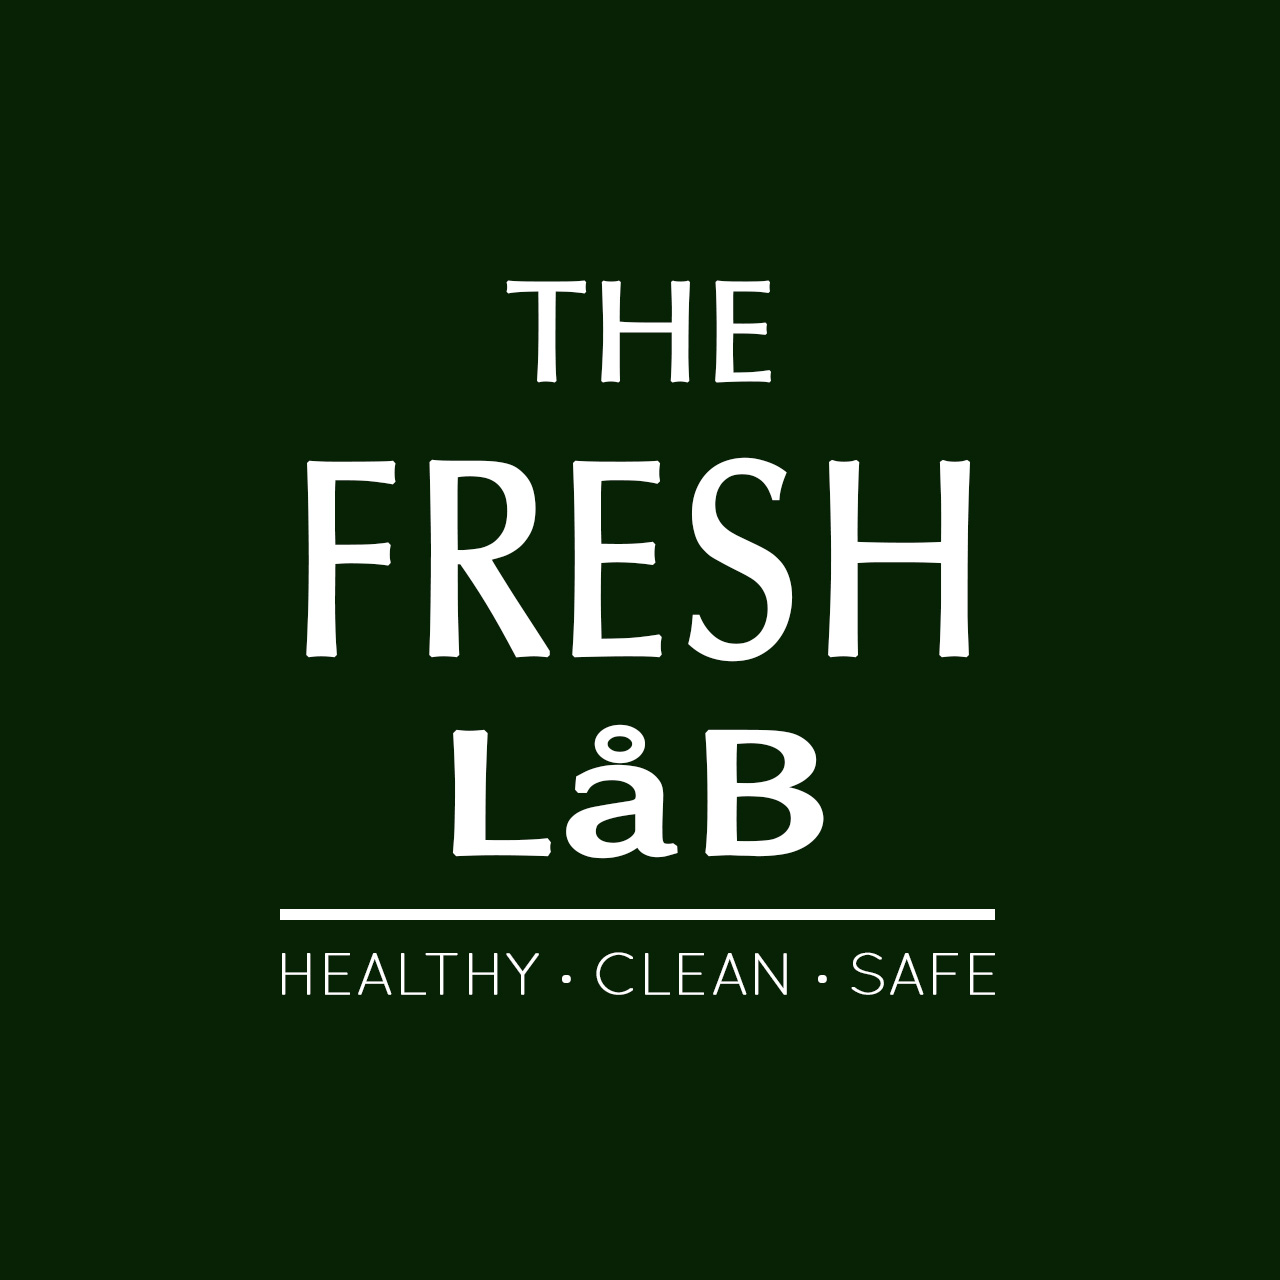 The Fresh Lab